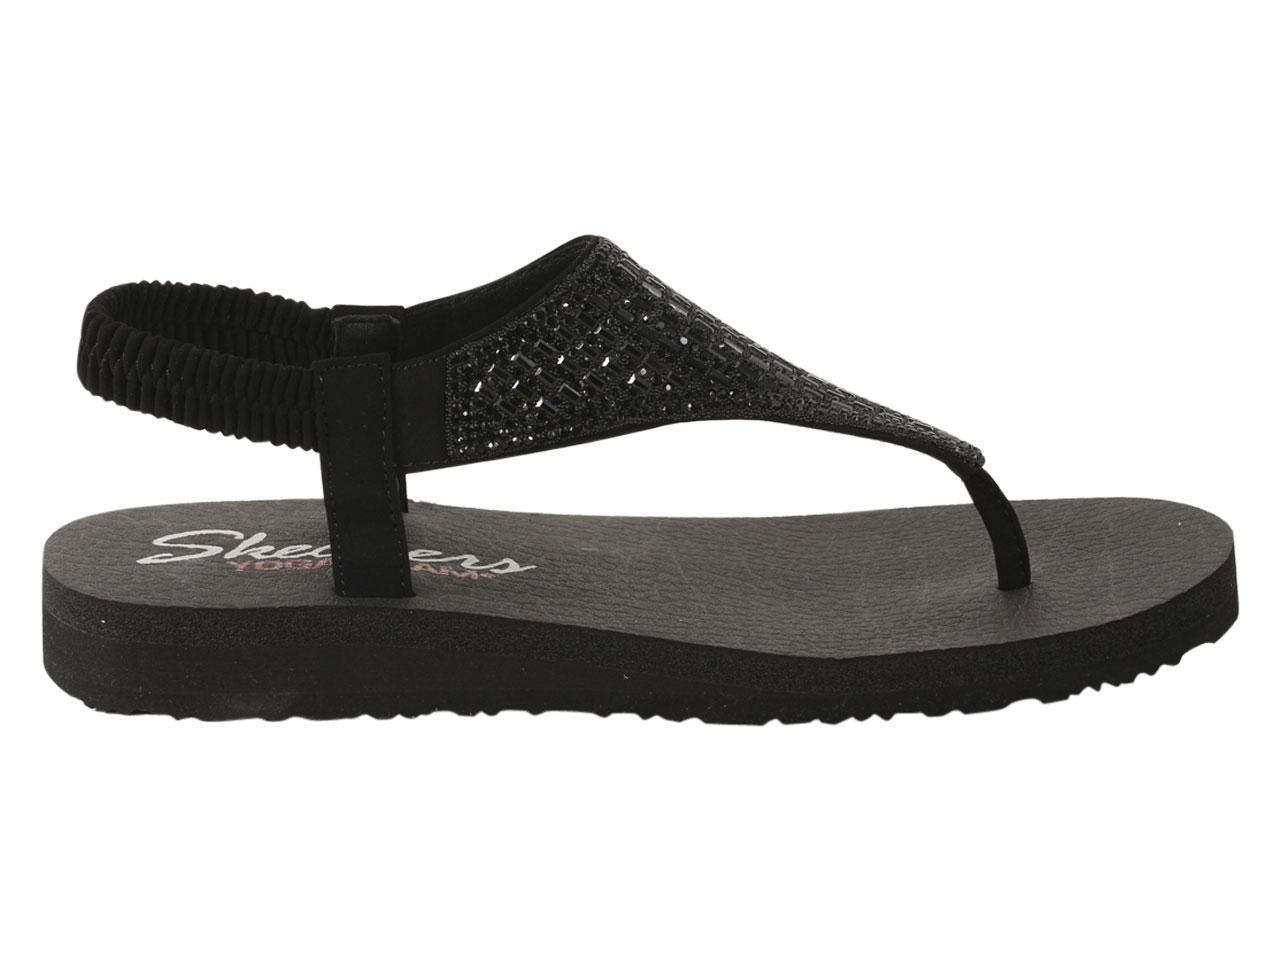 aee3e2a515da Skechers Women s Meditation Rock Crown Yoga Foam Sandals Shoes